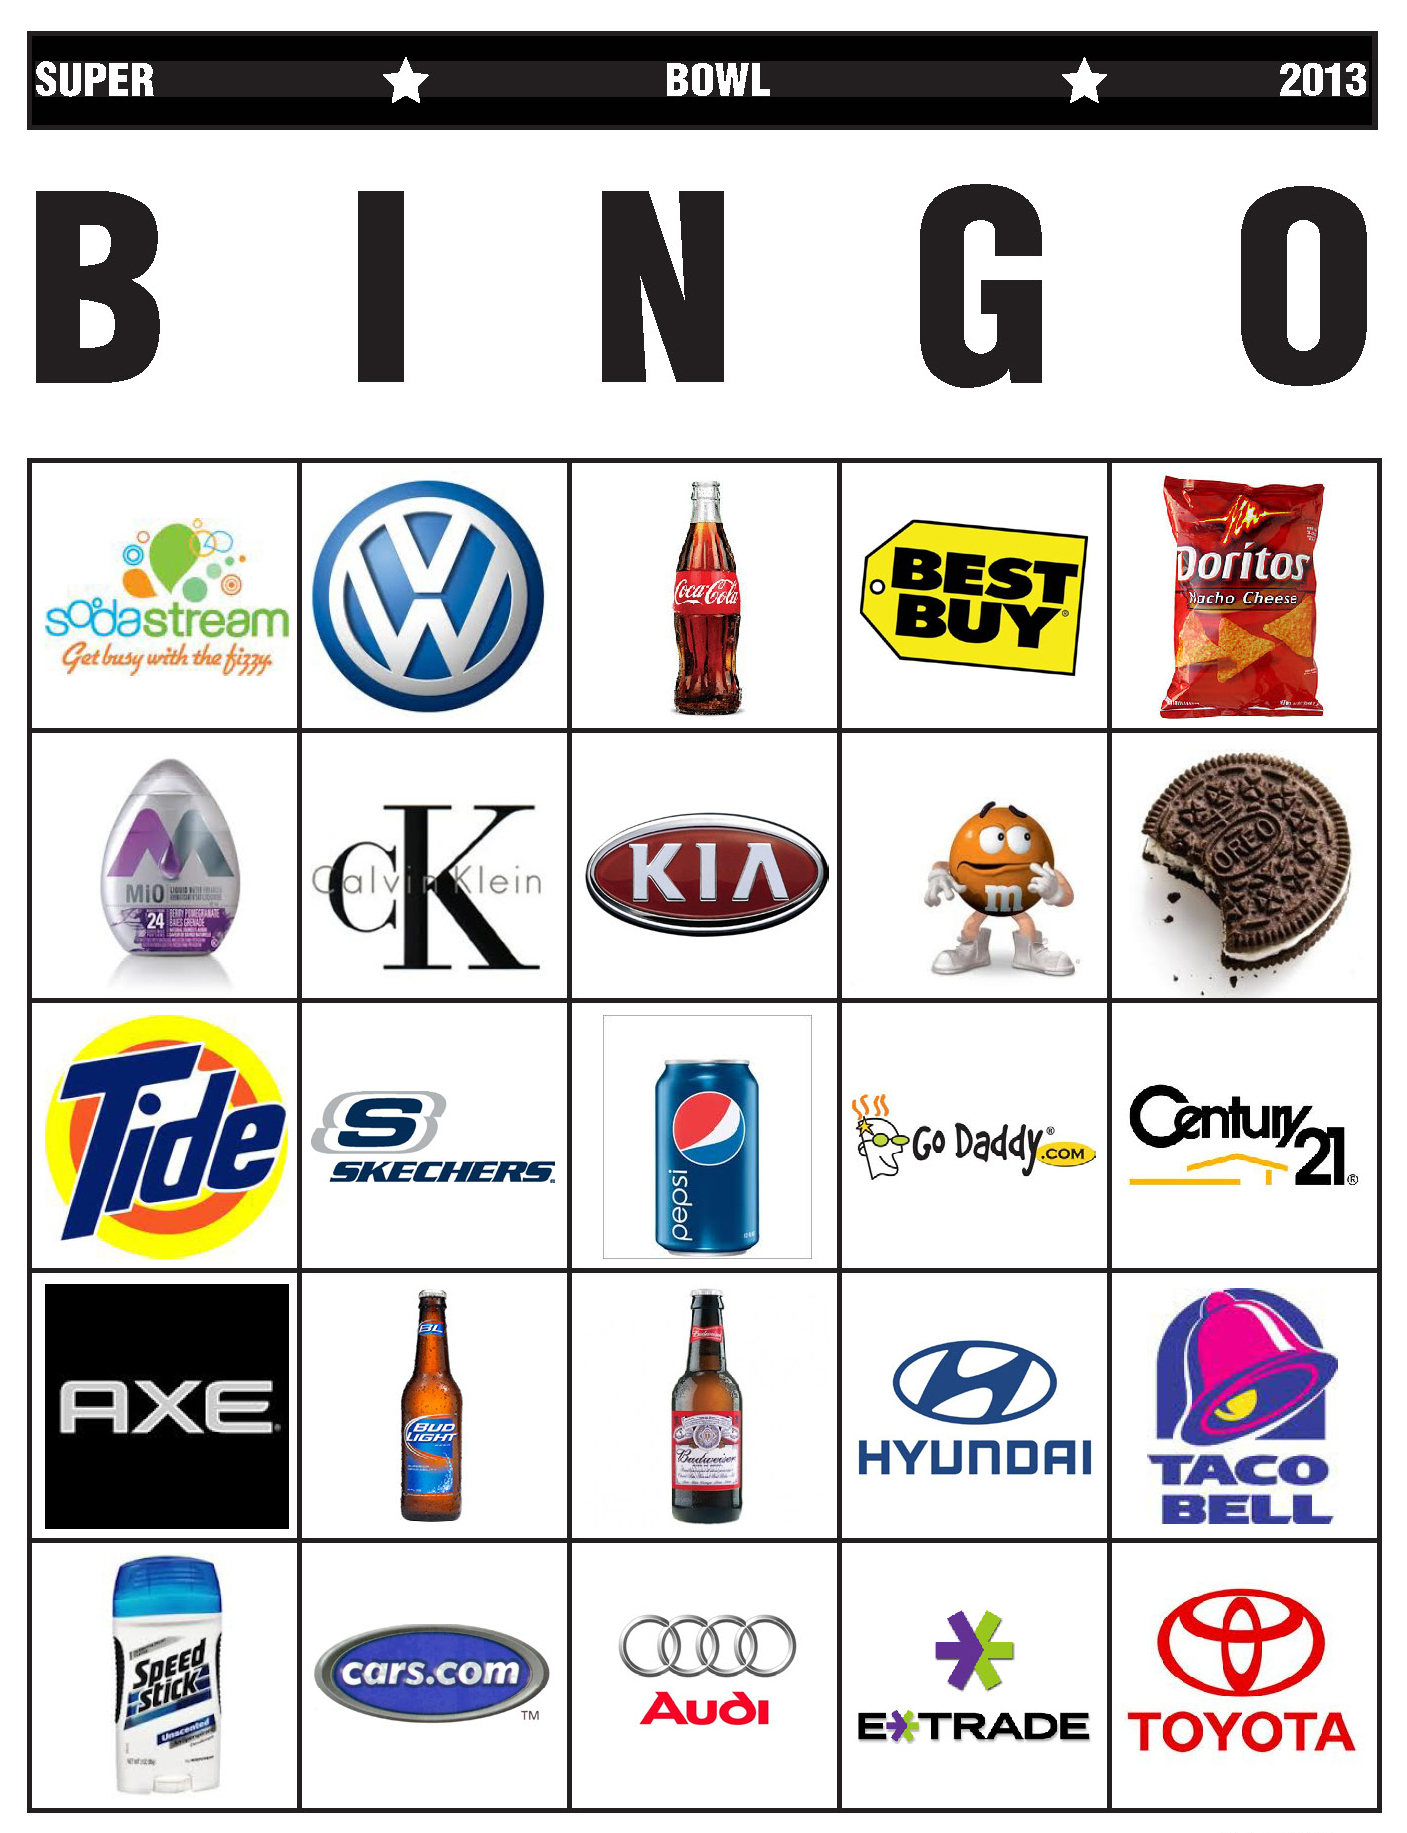 graphic about Printable Super Bowl Bingo Cards known as Tremendous Bowl Bingo, 2013 Model Calamity Jennie